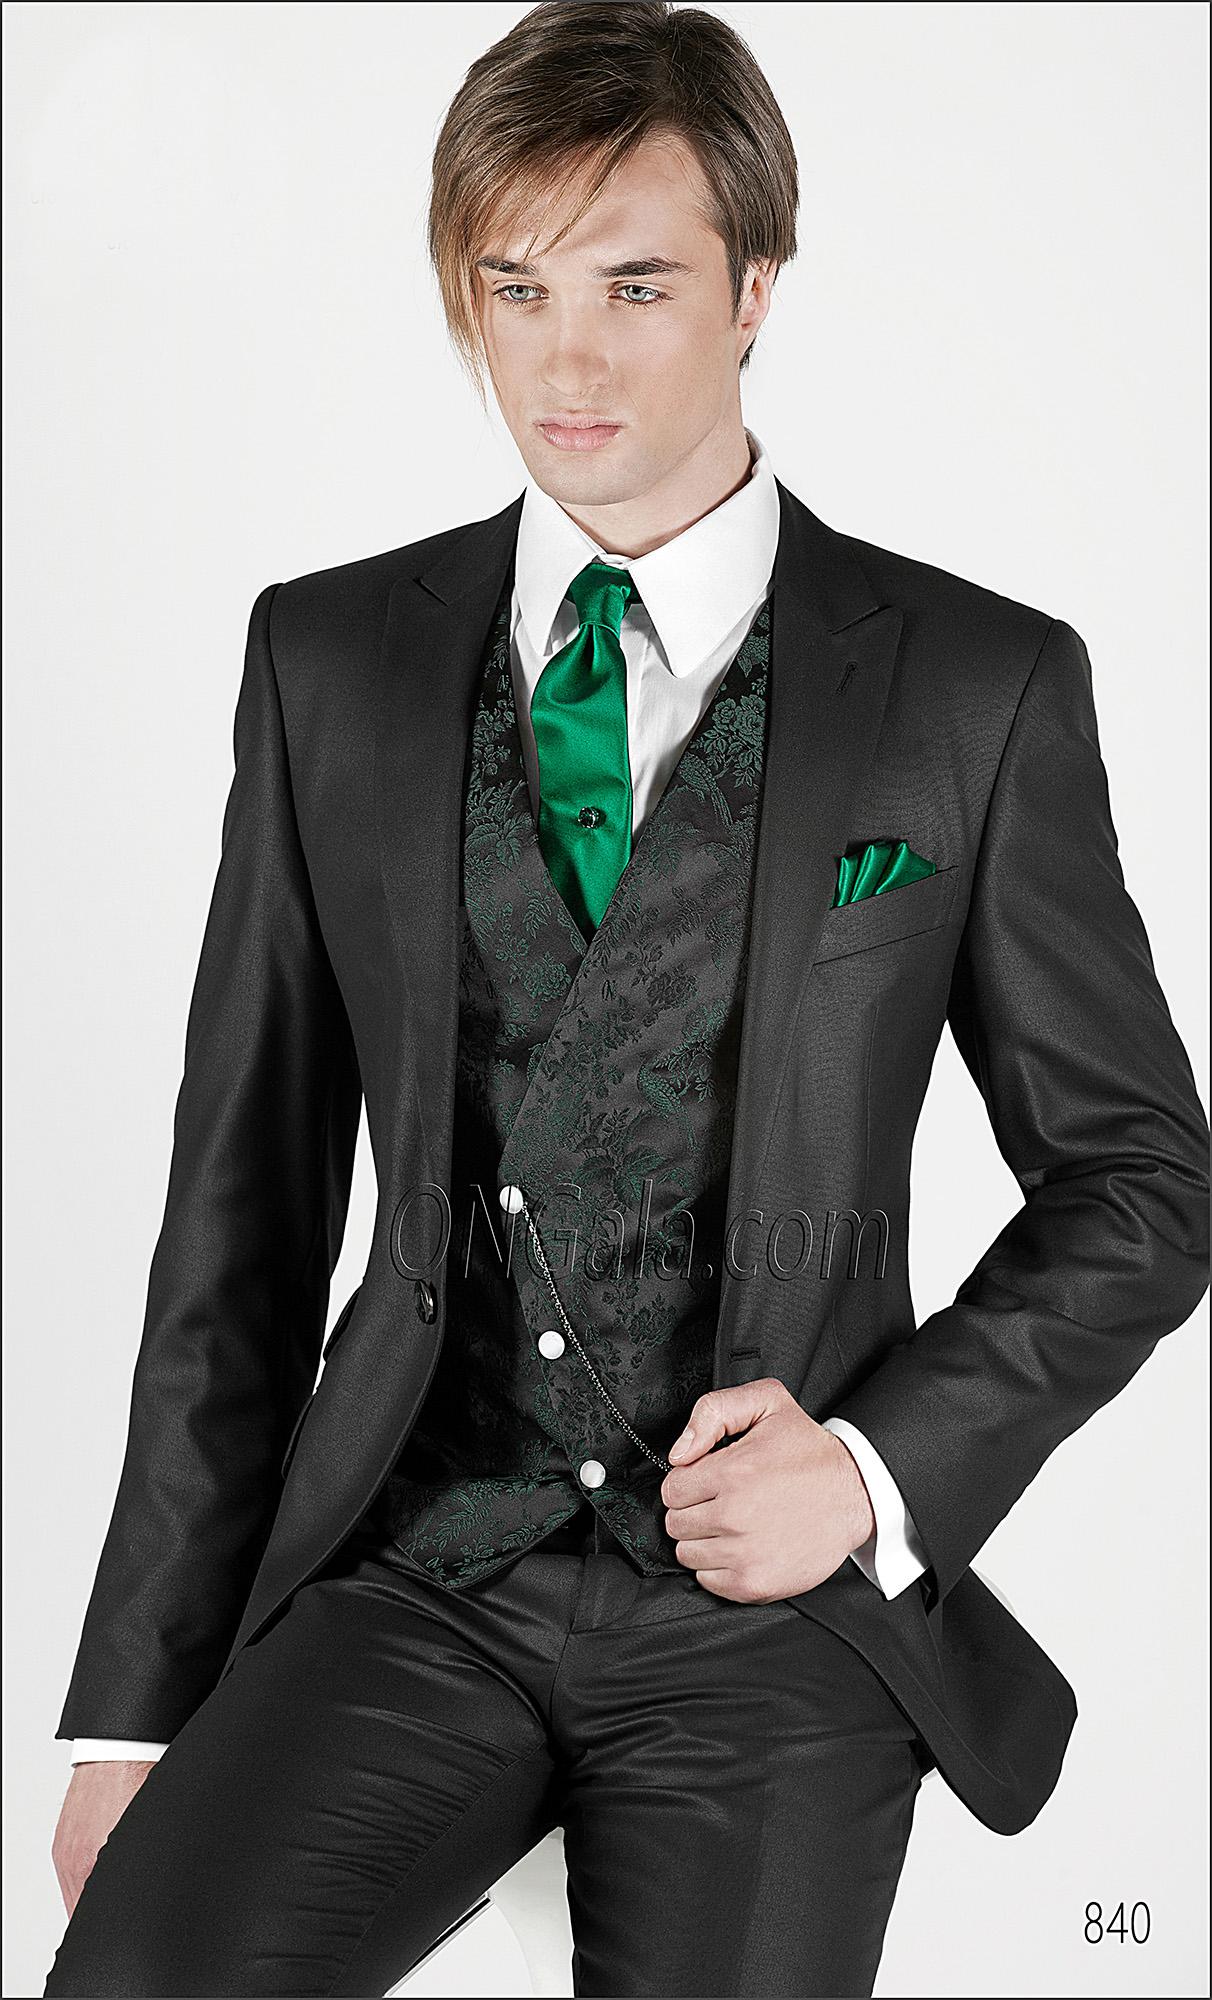 Abito Matrimonio Uomo Verde : Abito da cerimonia uomo con ticket pocket gilet